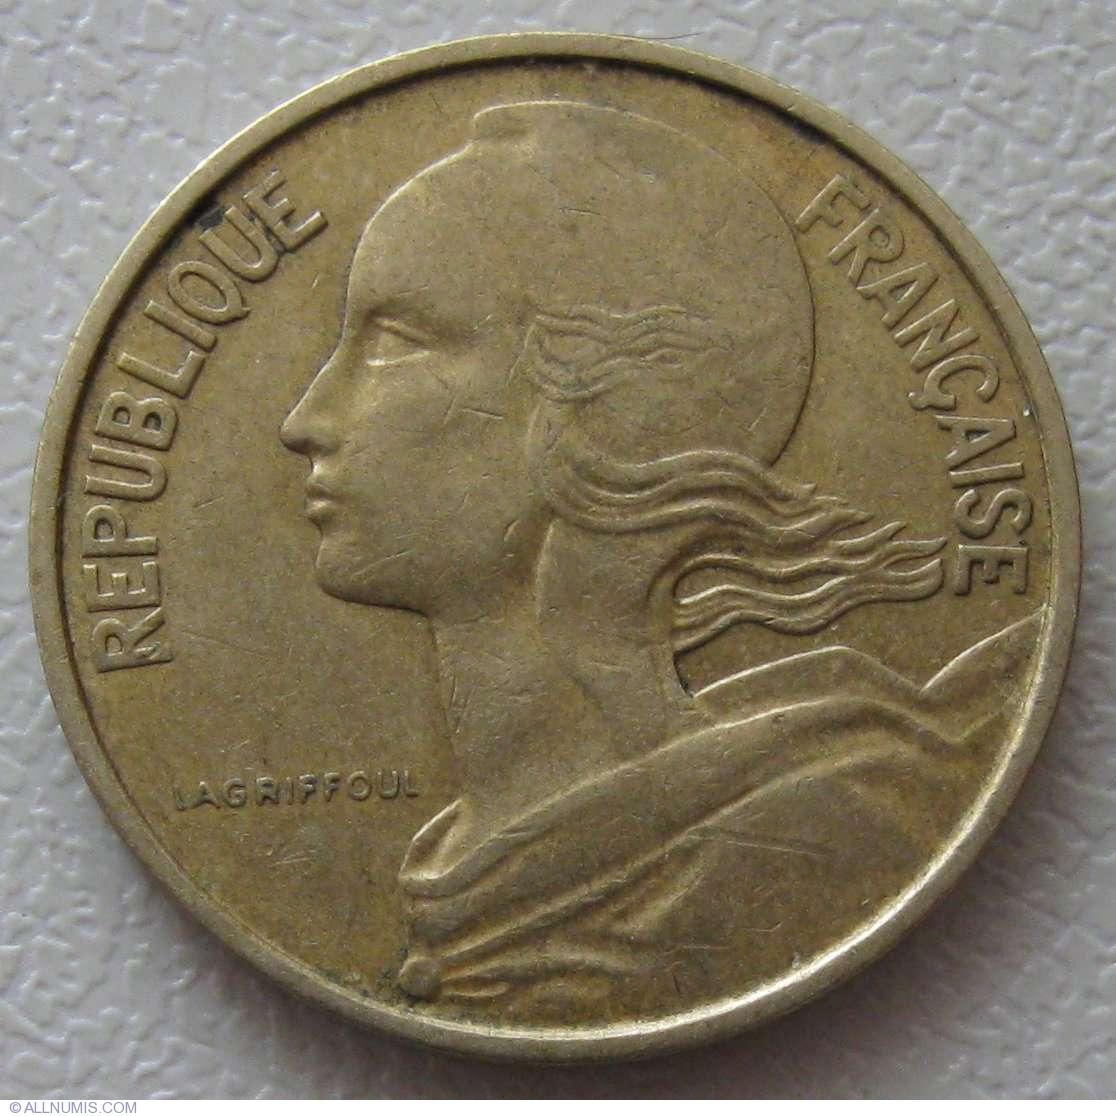 10 Centimes 1963, Fifth Republic (1958-1970)